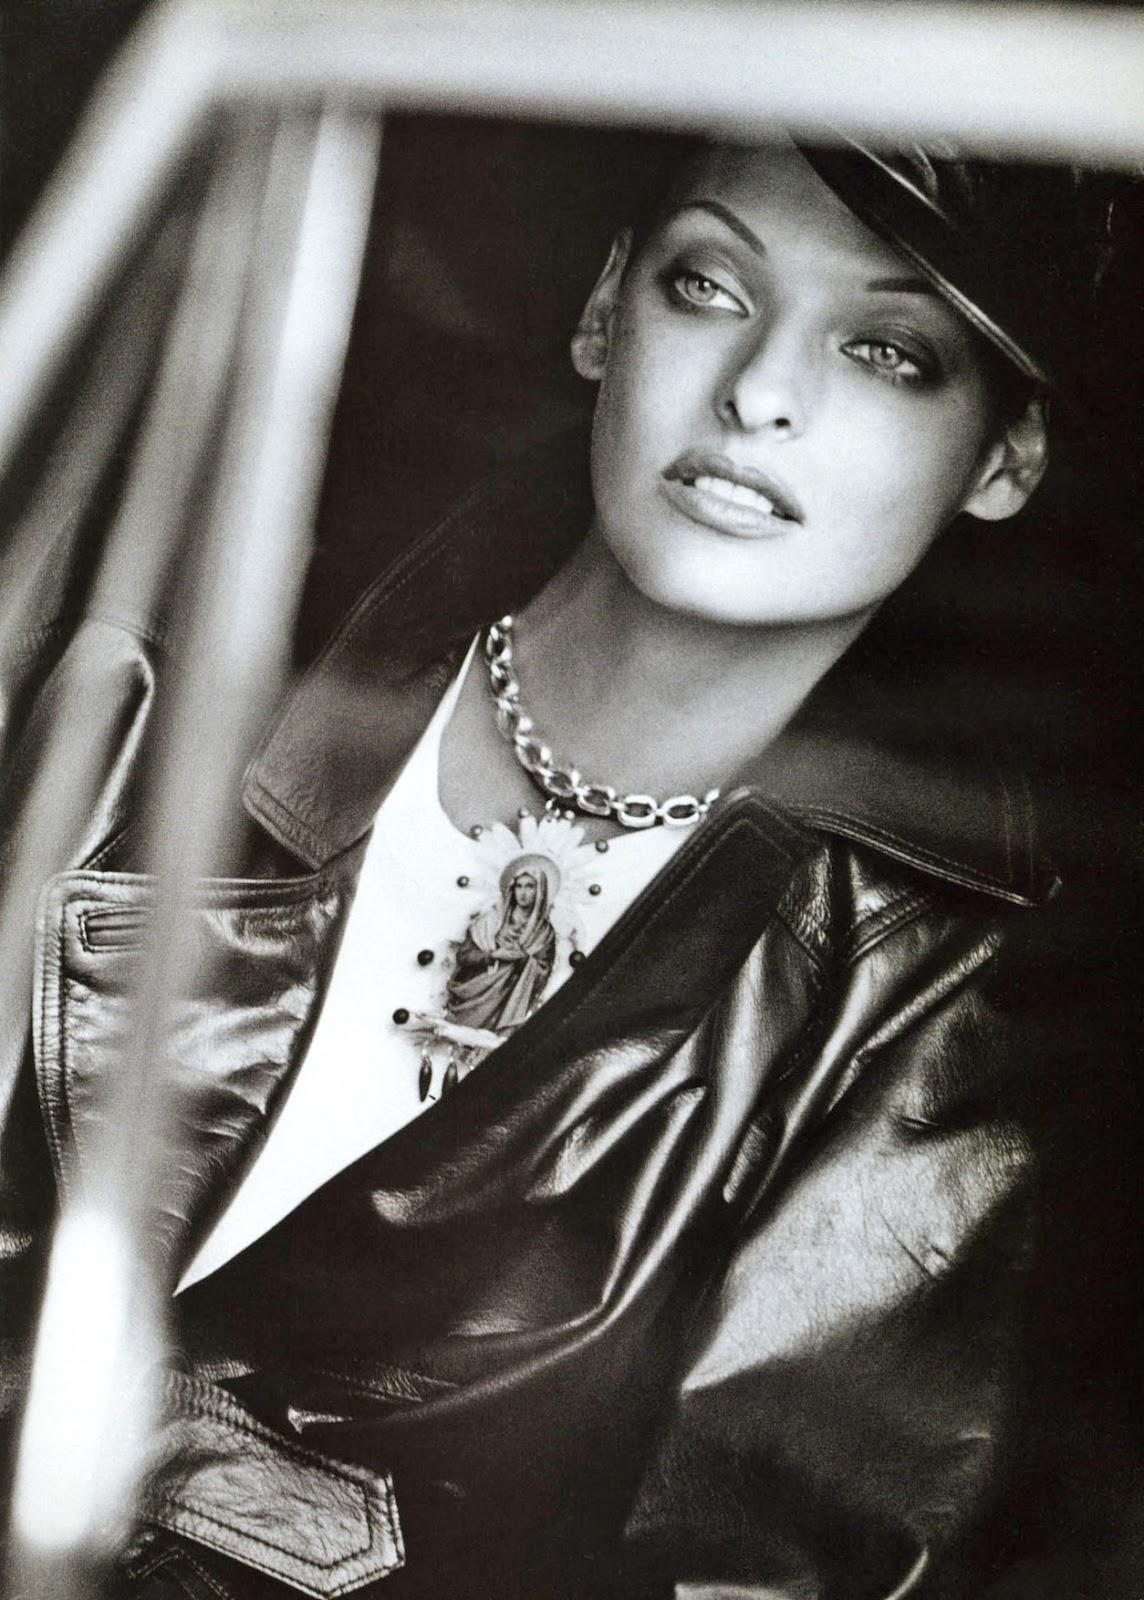 http://1.bp.blogspot.com/-2rAb5eY2tlE/T0-1w_XY8lI/AAAAAAAAC6Y/7i0b-kUg1pE/s1600/Linda+Evangelista+1992+09+Vogue+Uk+Ph+Peter+Lindbergh+11.jpg